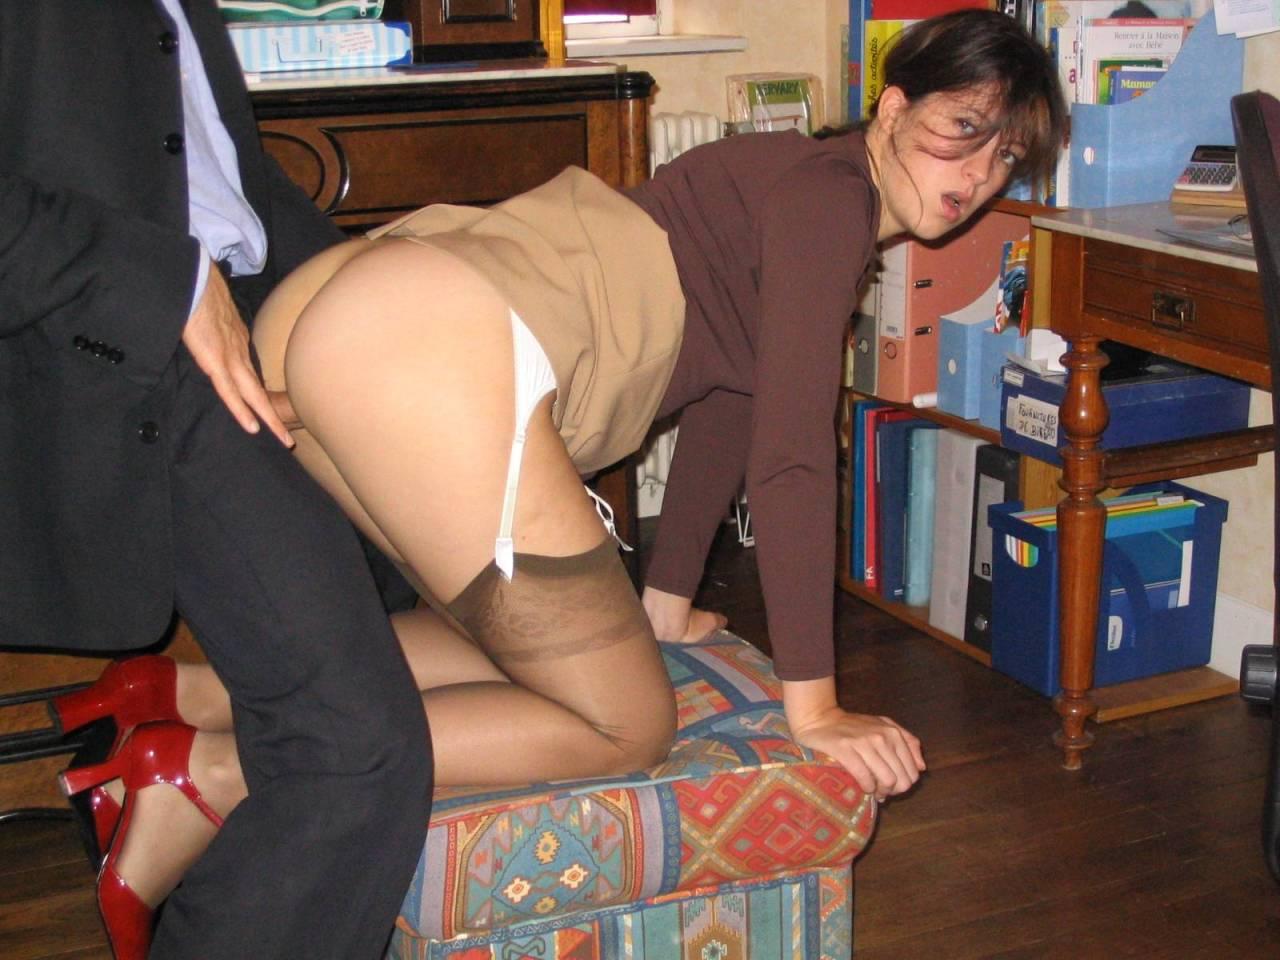 secretaries nude Real